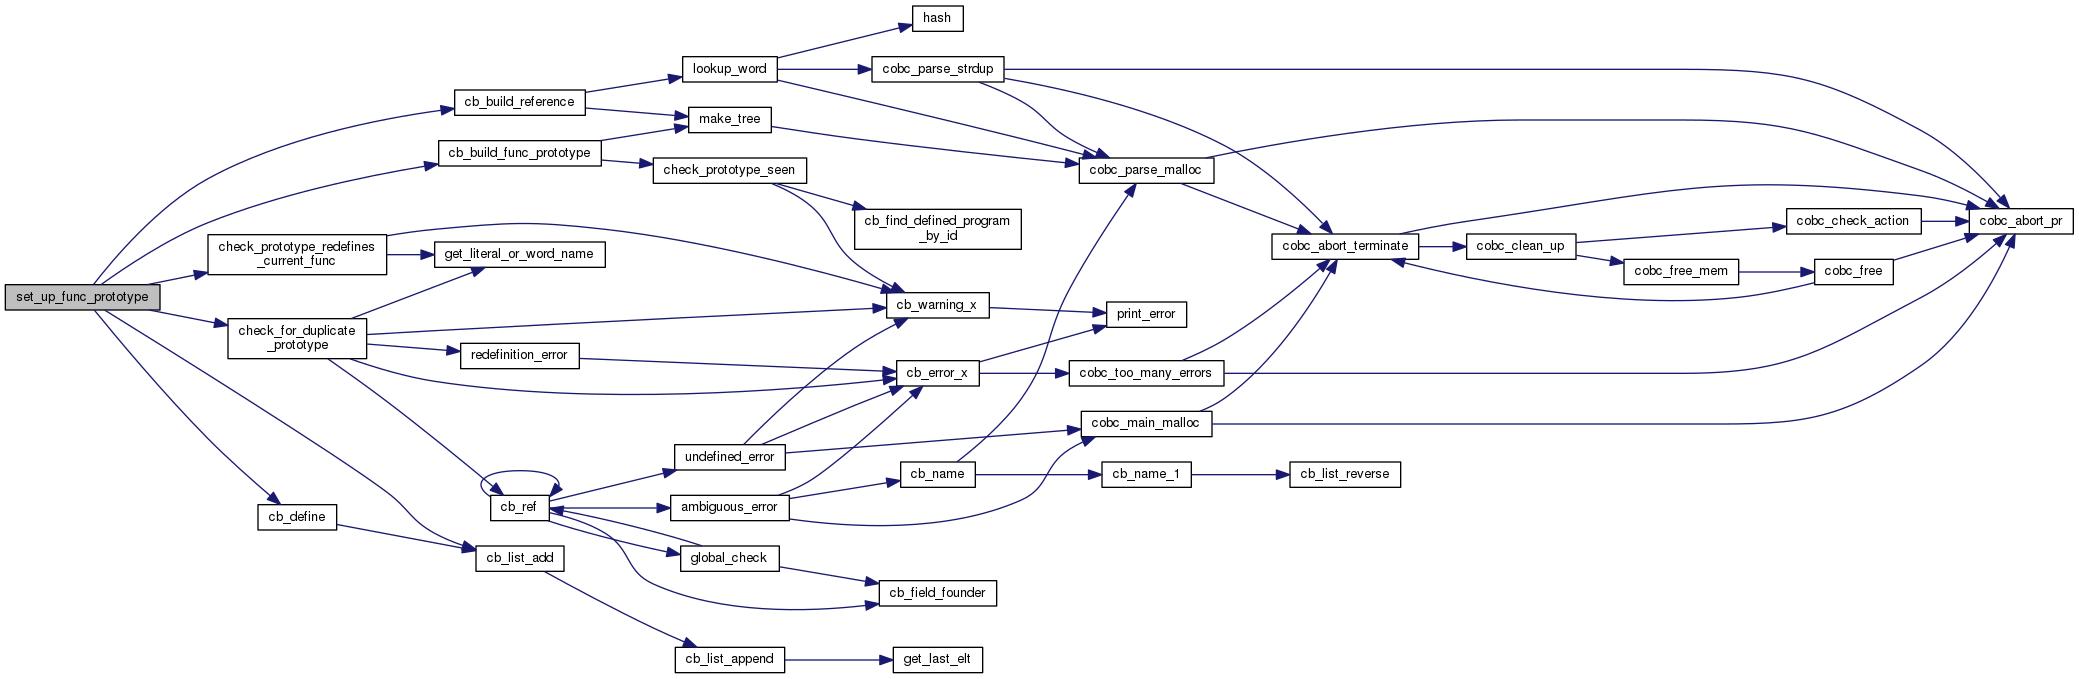 Malibu low voltage wiring diagram - Diagrams online on